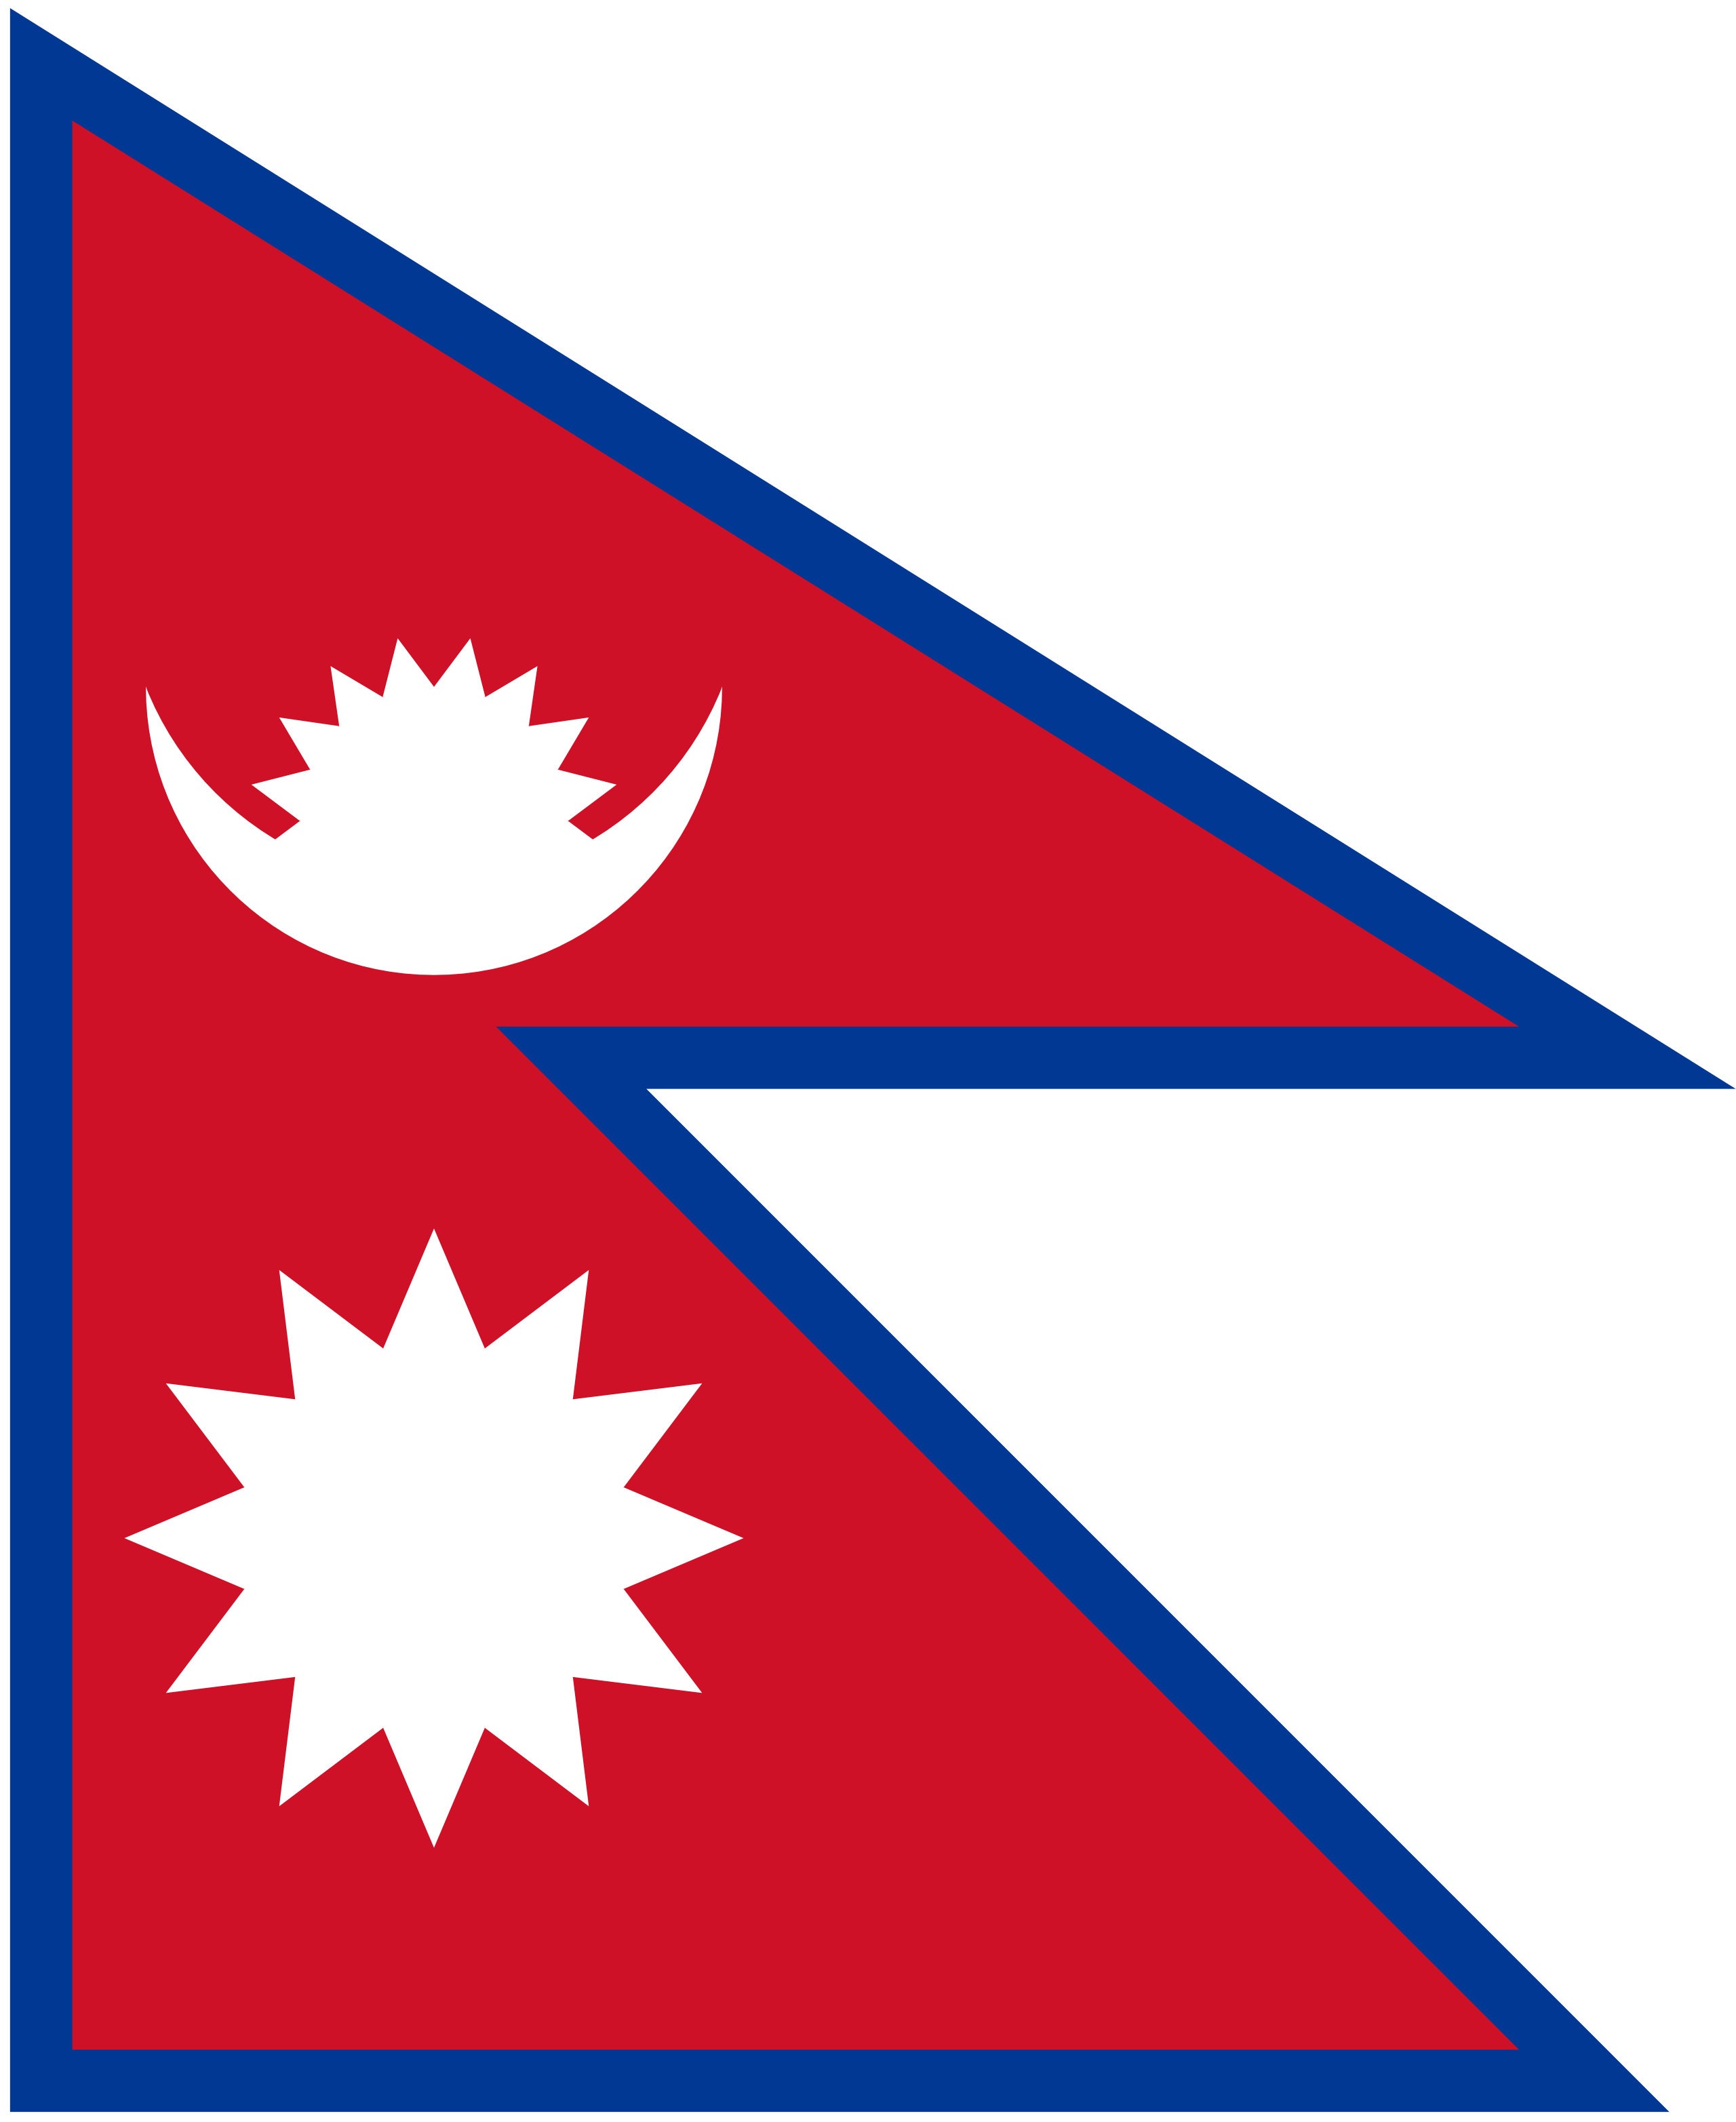 Népal, pays, emblème, logo, symbole - Fonds d'écran HD - Professor-falken.com